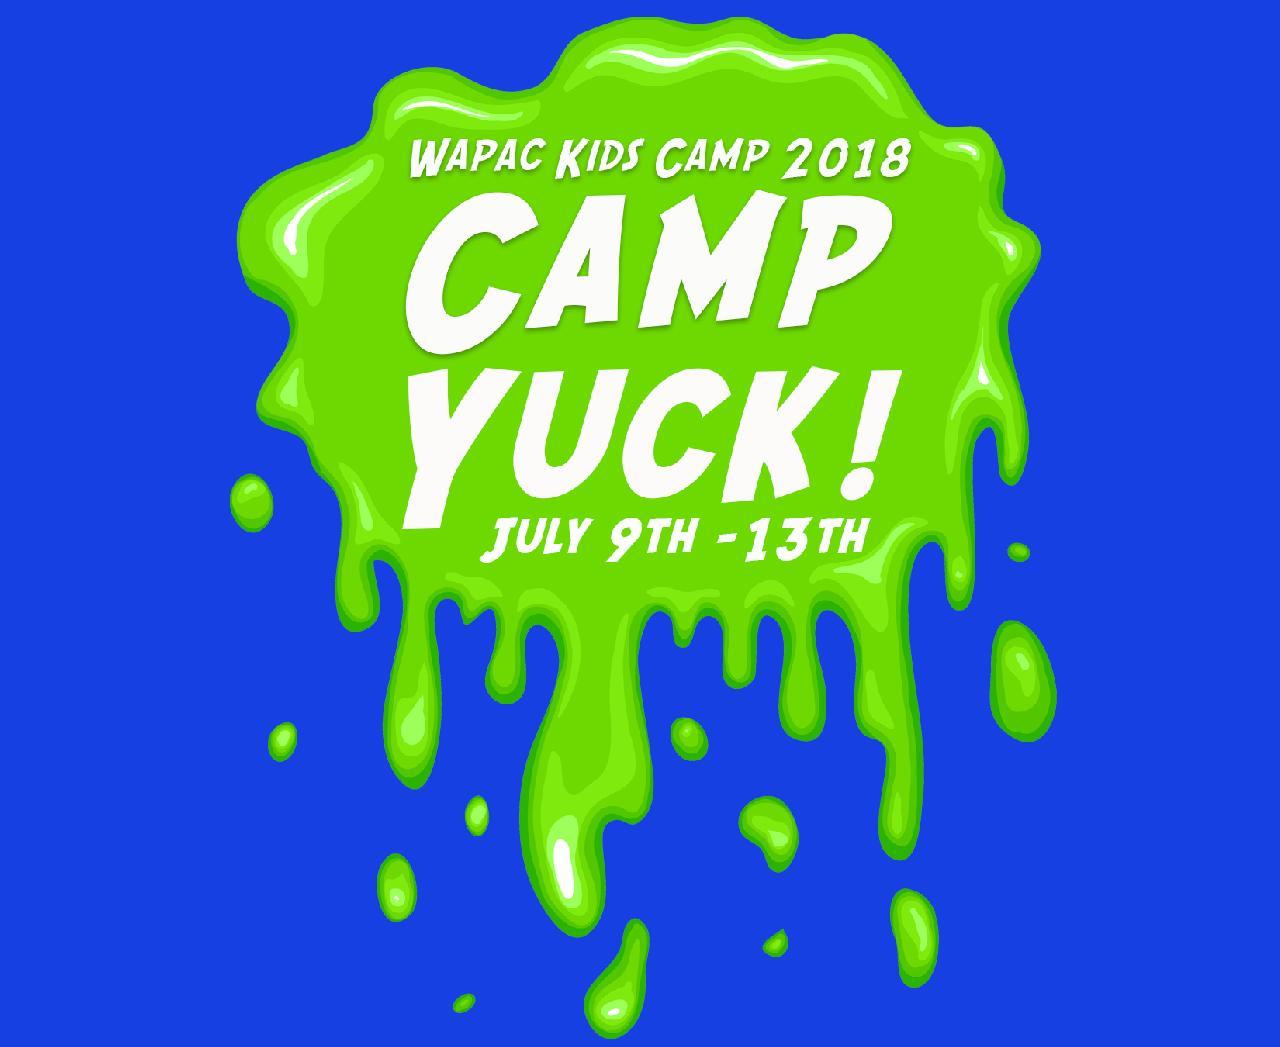 WAPAC Kids Camp